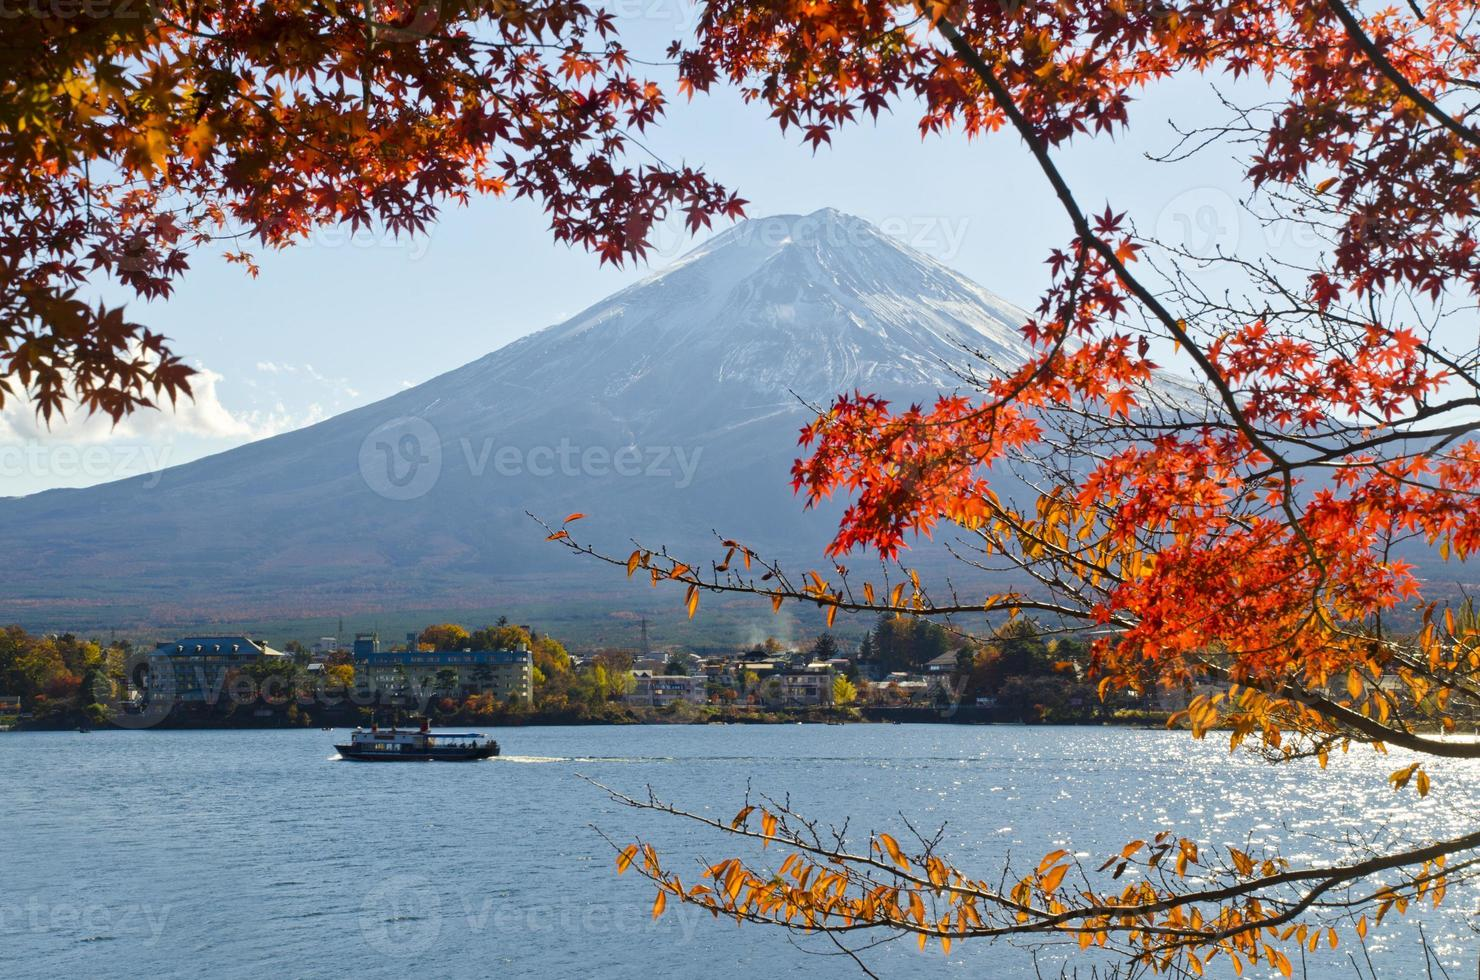 fuji en herfstseizoen foto